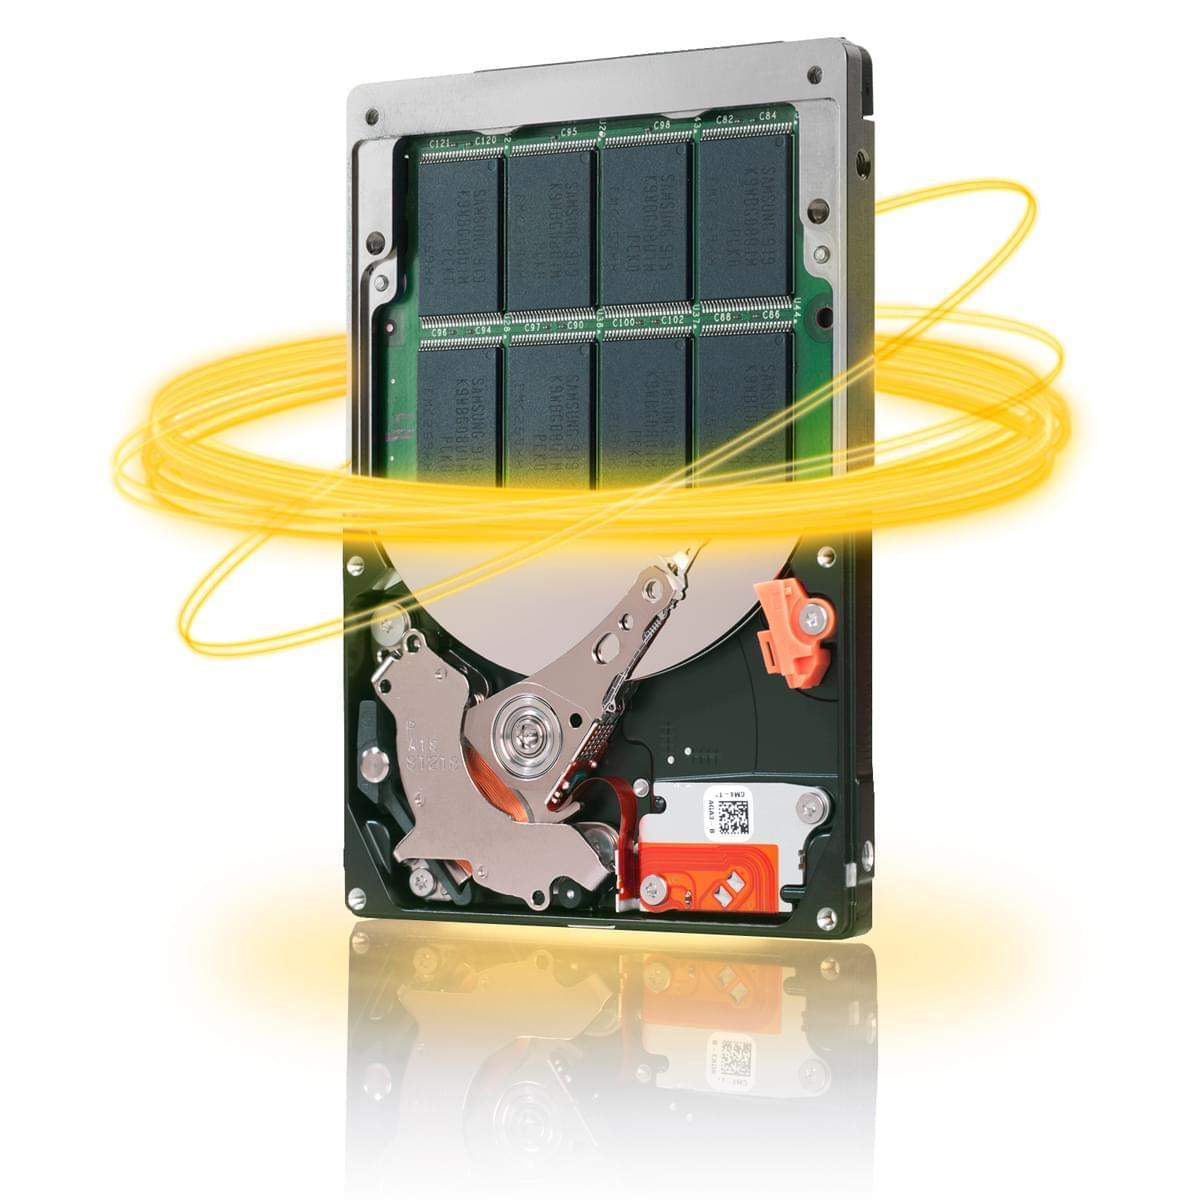 "Seagate 500Go 7200Tr SATA 32Mo Hybrid Momentus XT - Disque dur interne 2.5"" - 0"